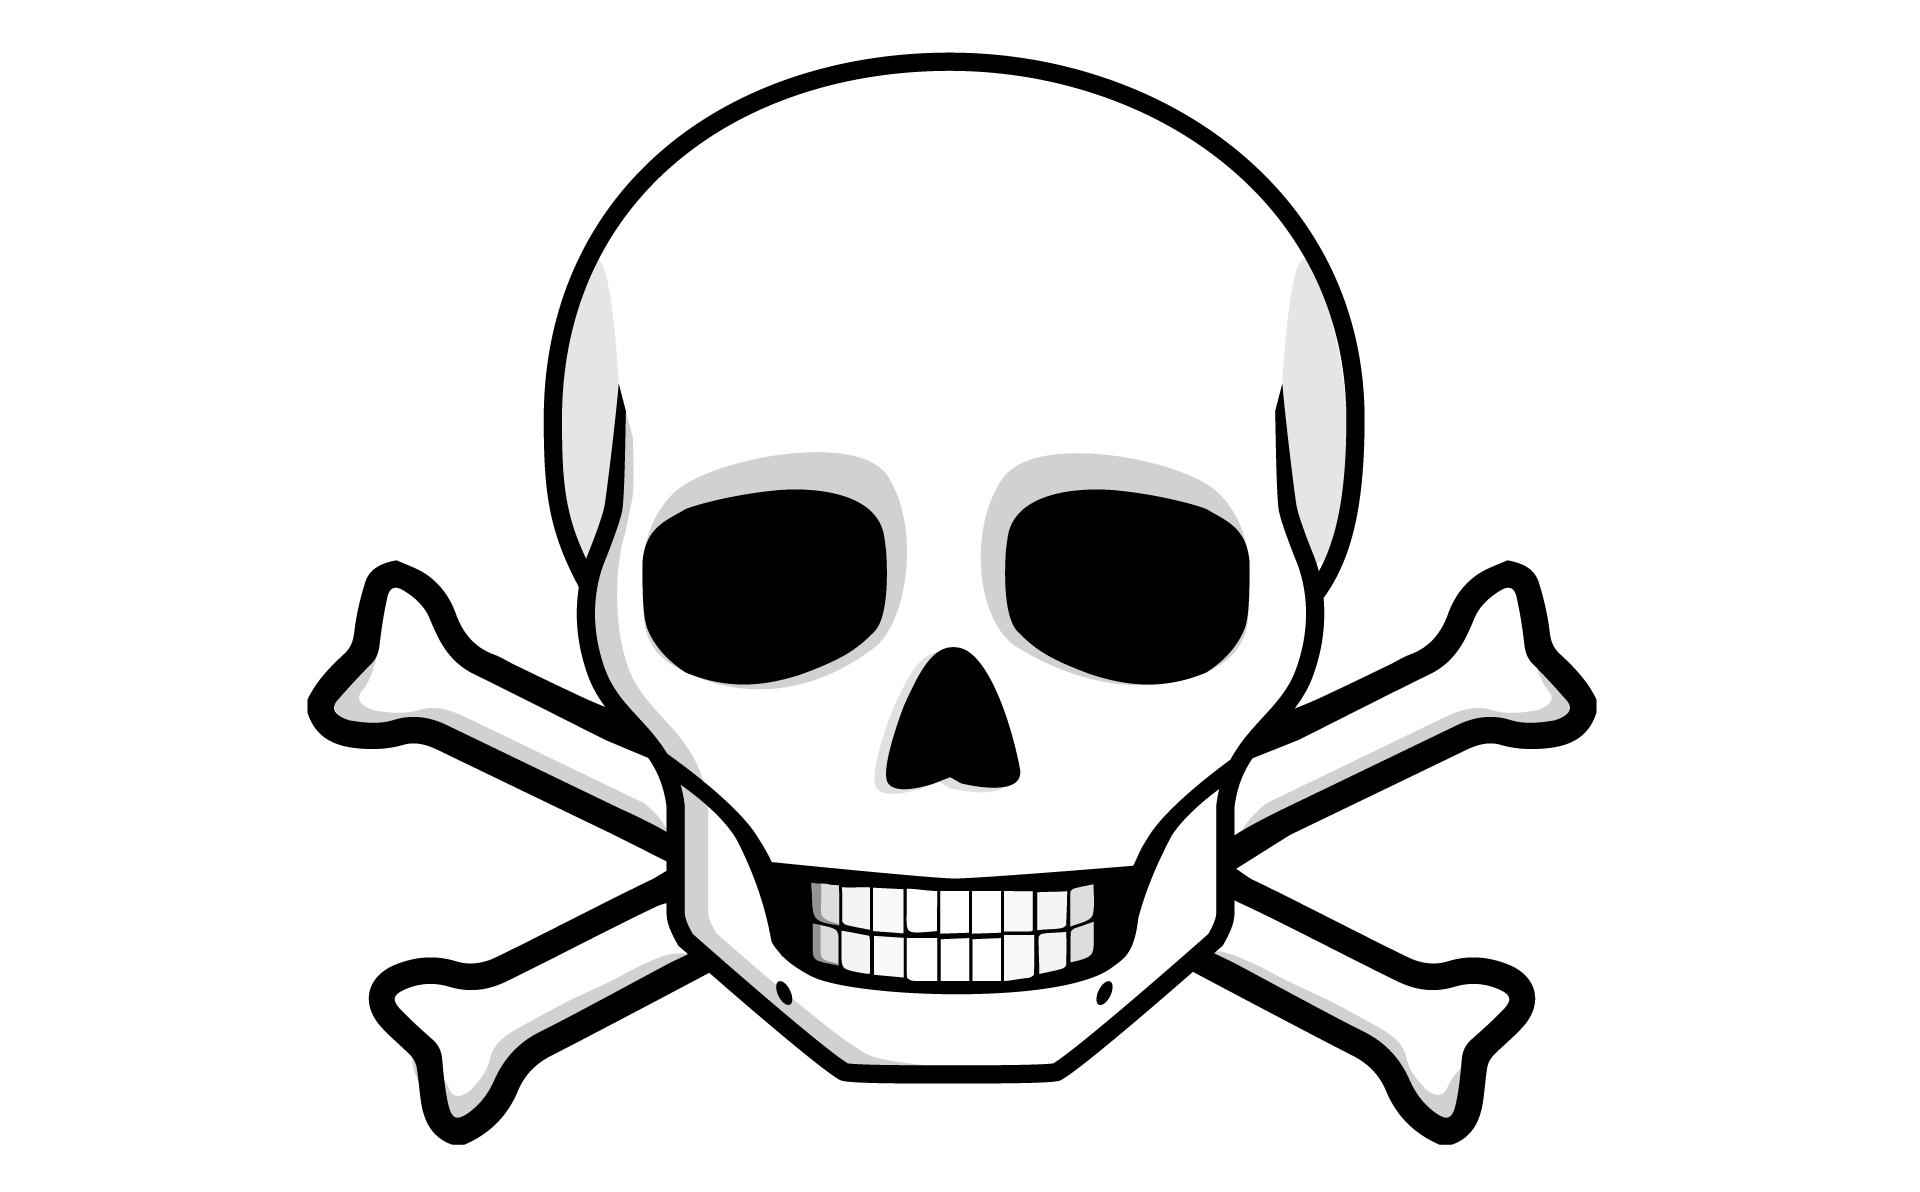 Free Skull And Bones, Download Free Clip Art, Free Clip Art.